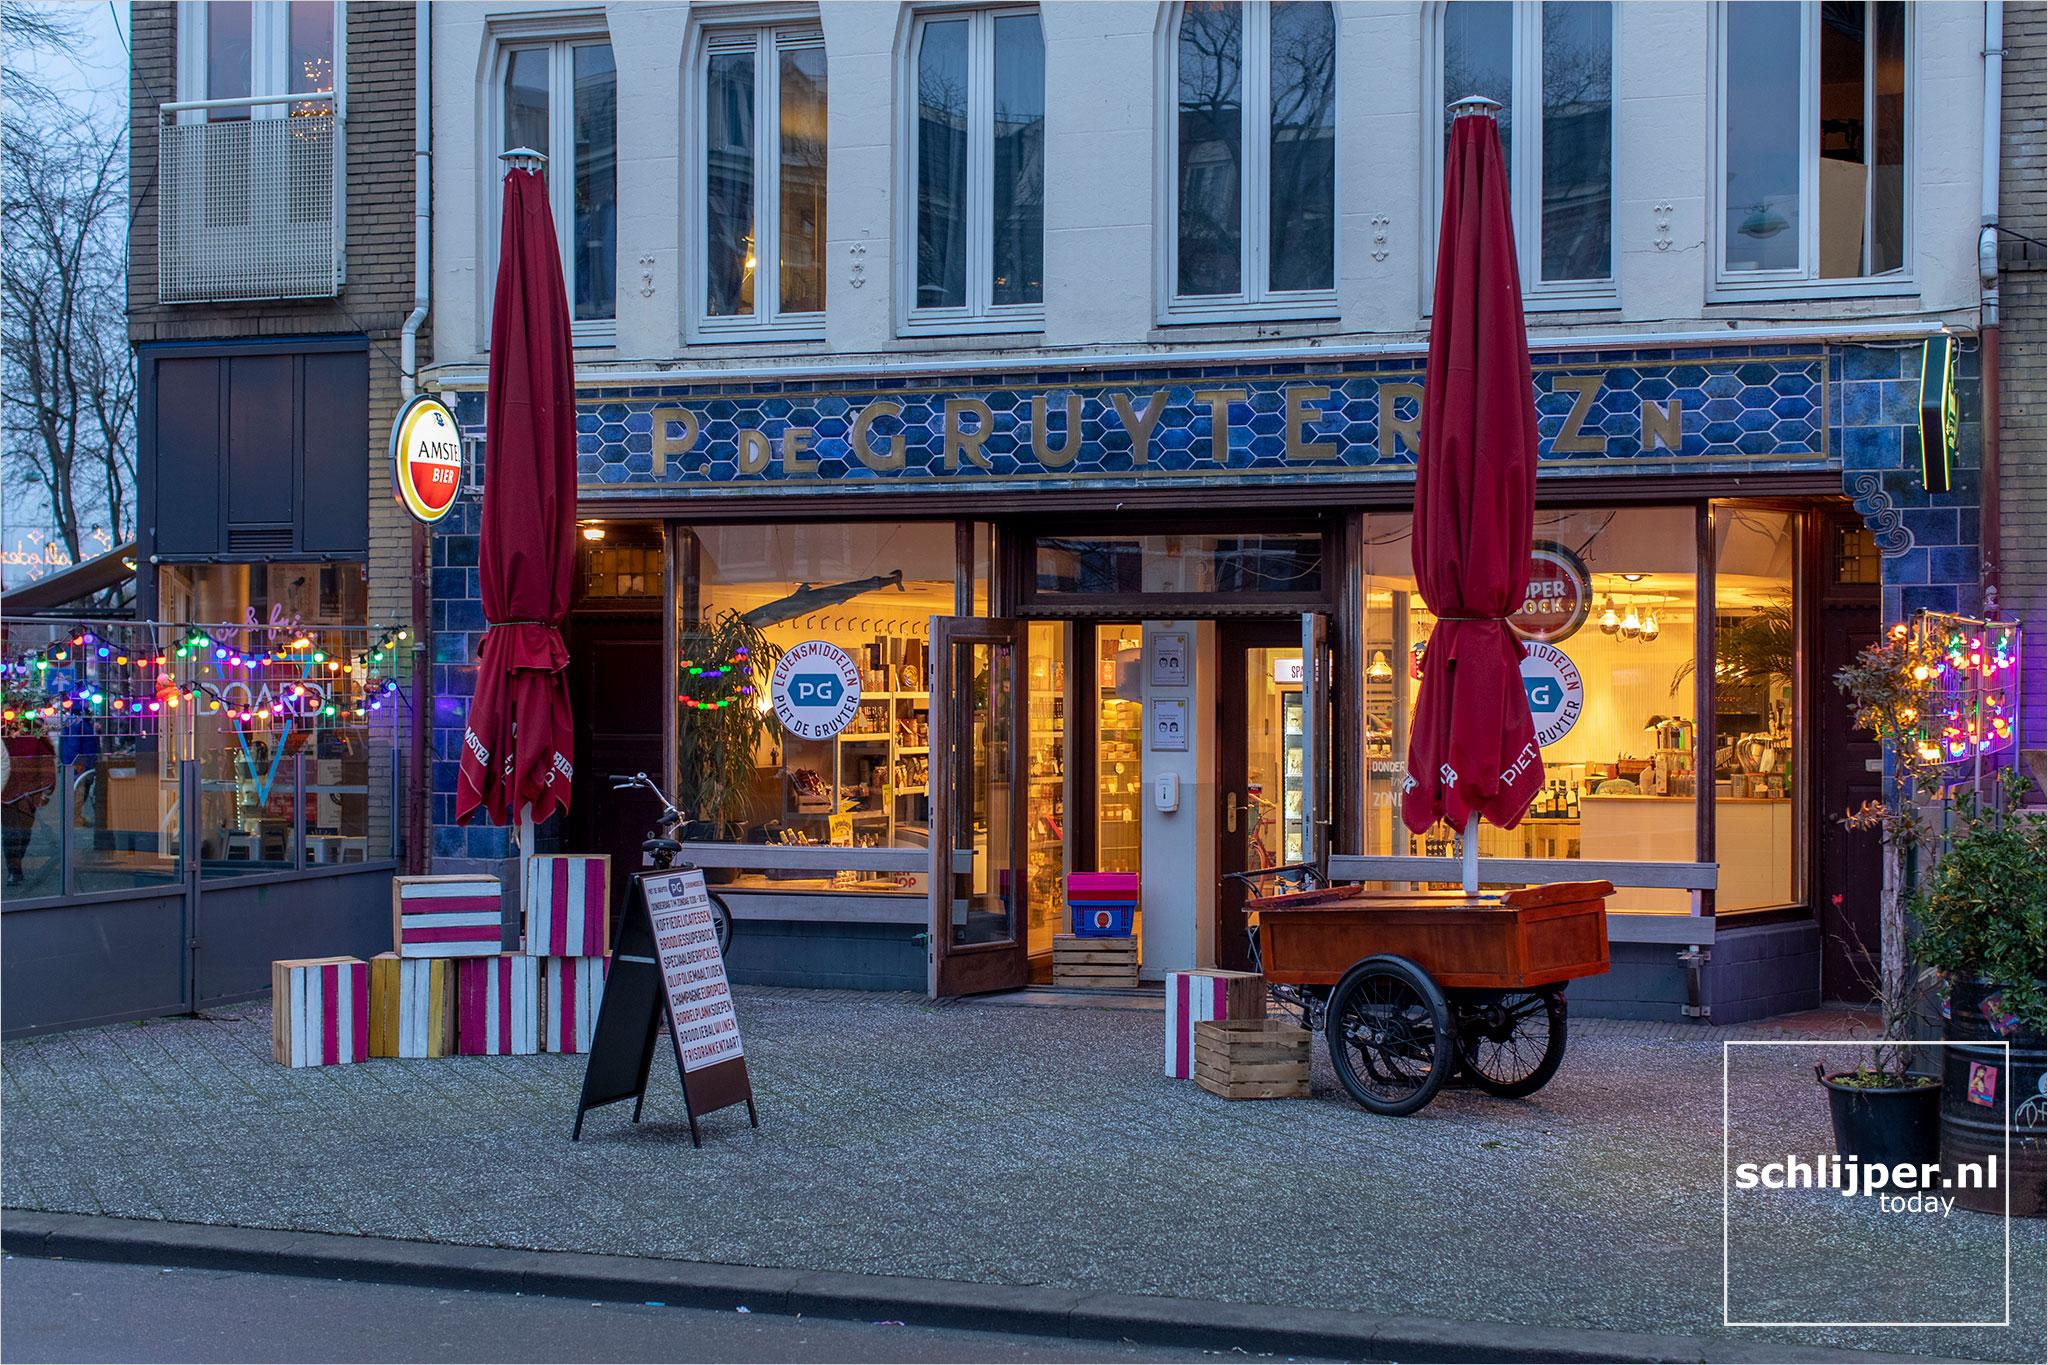 The Netherlands, Amsterdam, 10 januari 2021